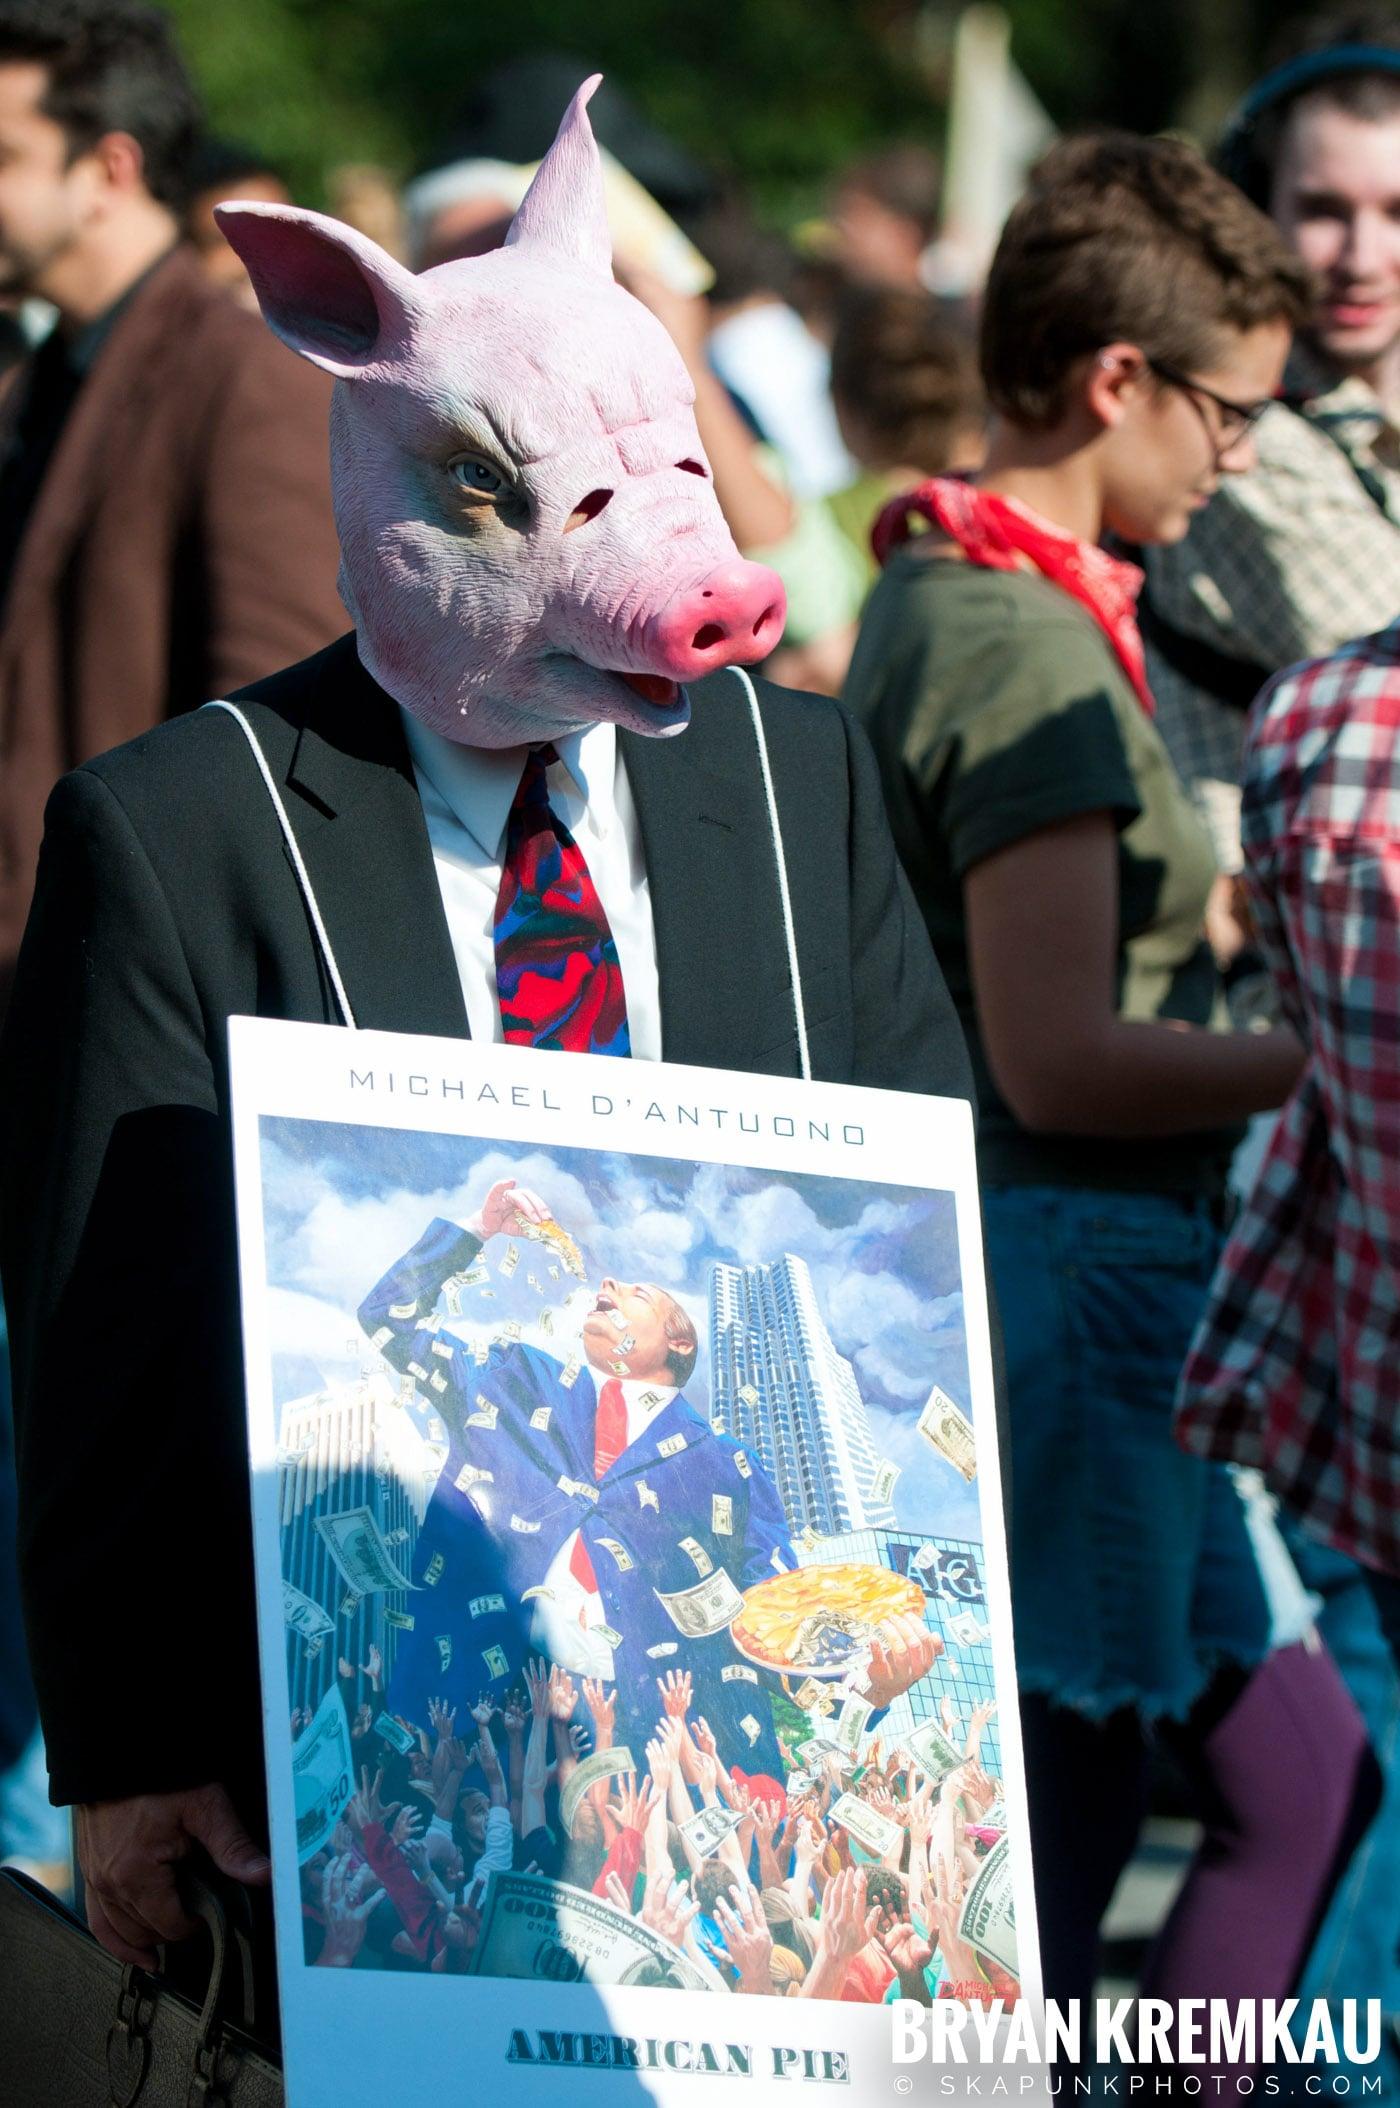 Occupy Wall Street @ Zuccotti Park and Washington Square Park, NYC - 10.15.11 (8)